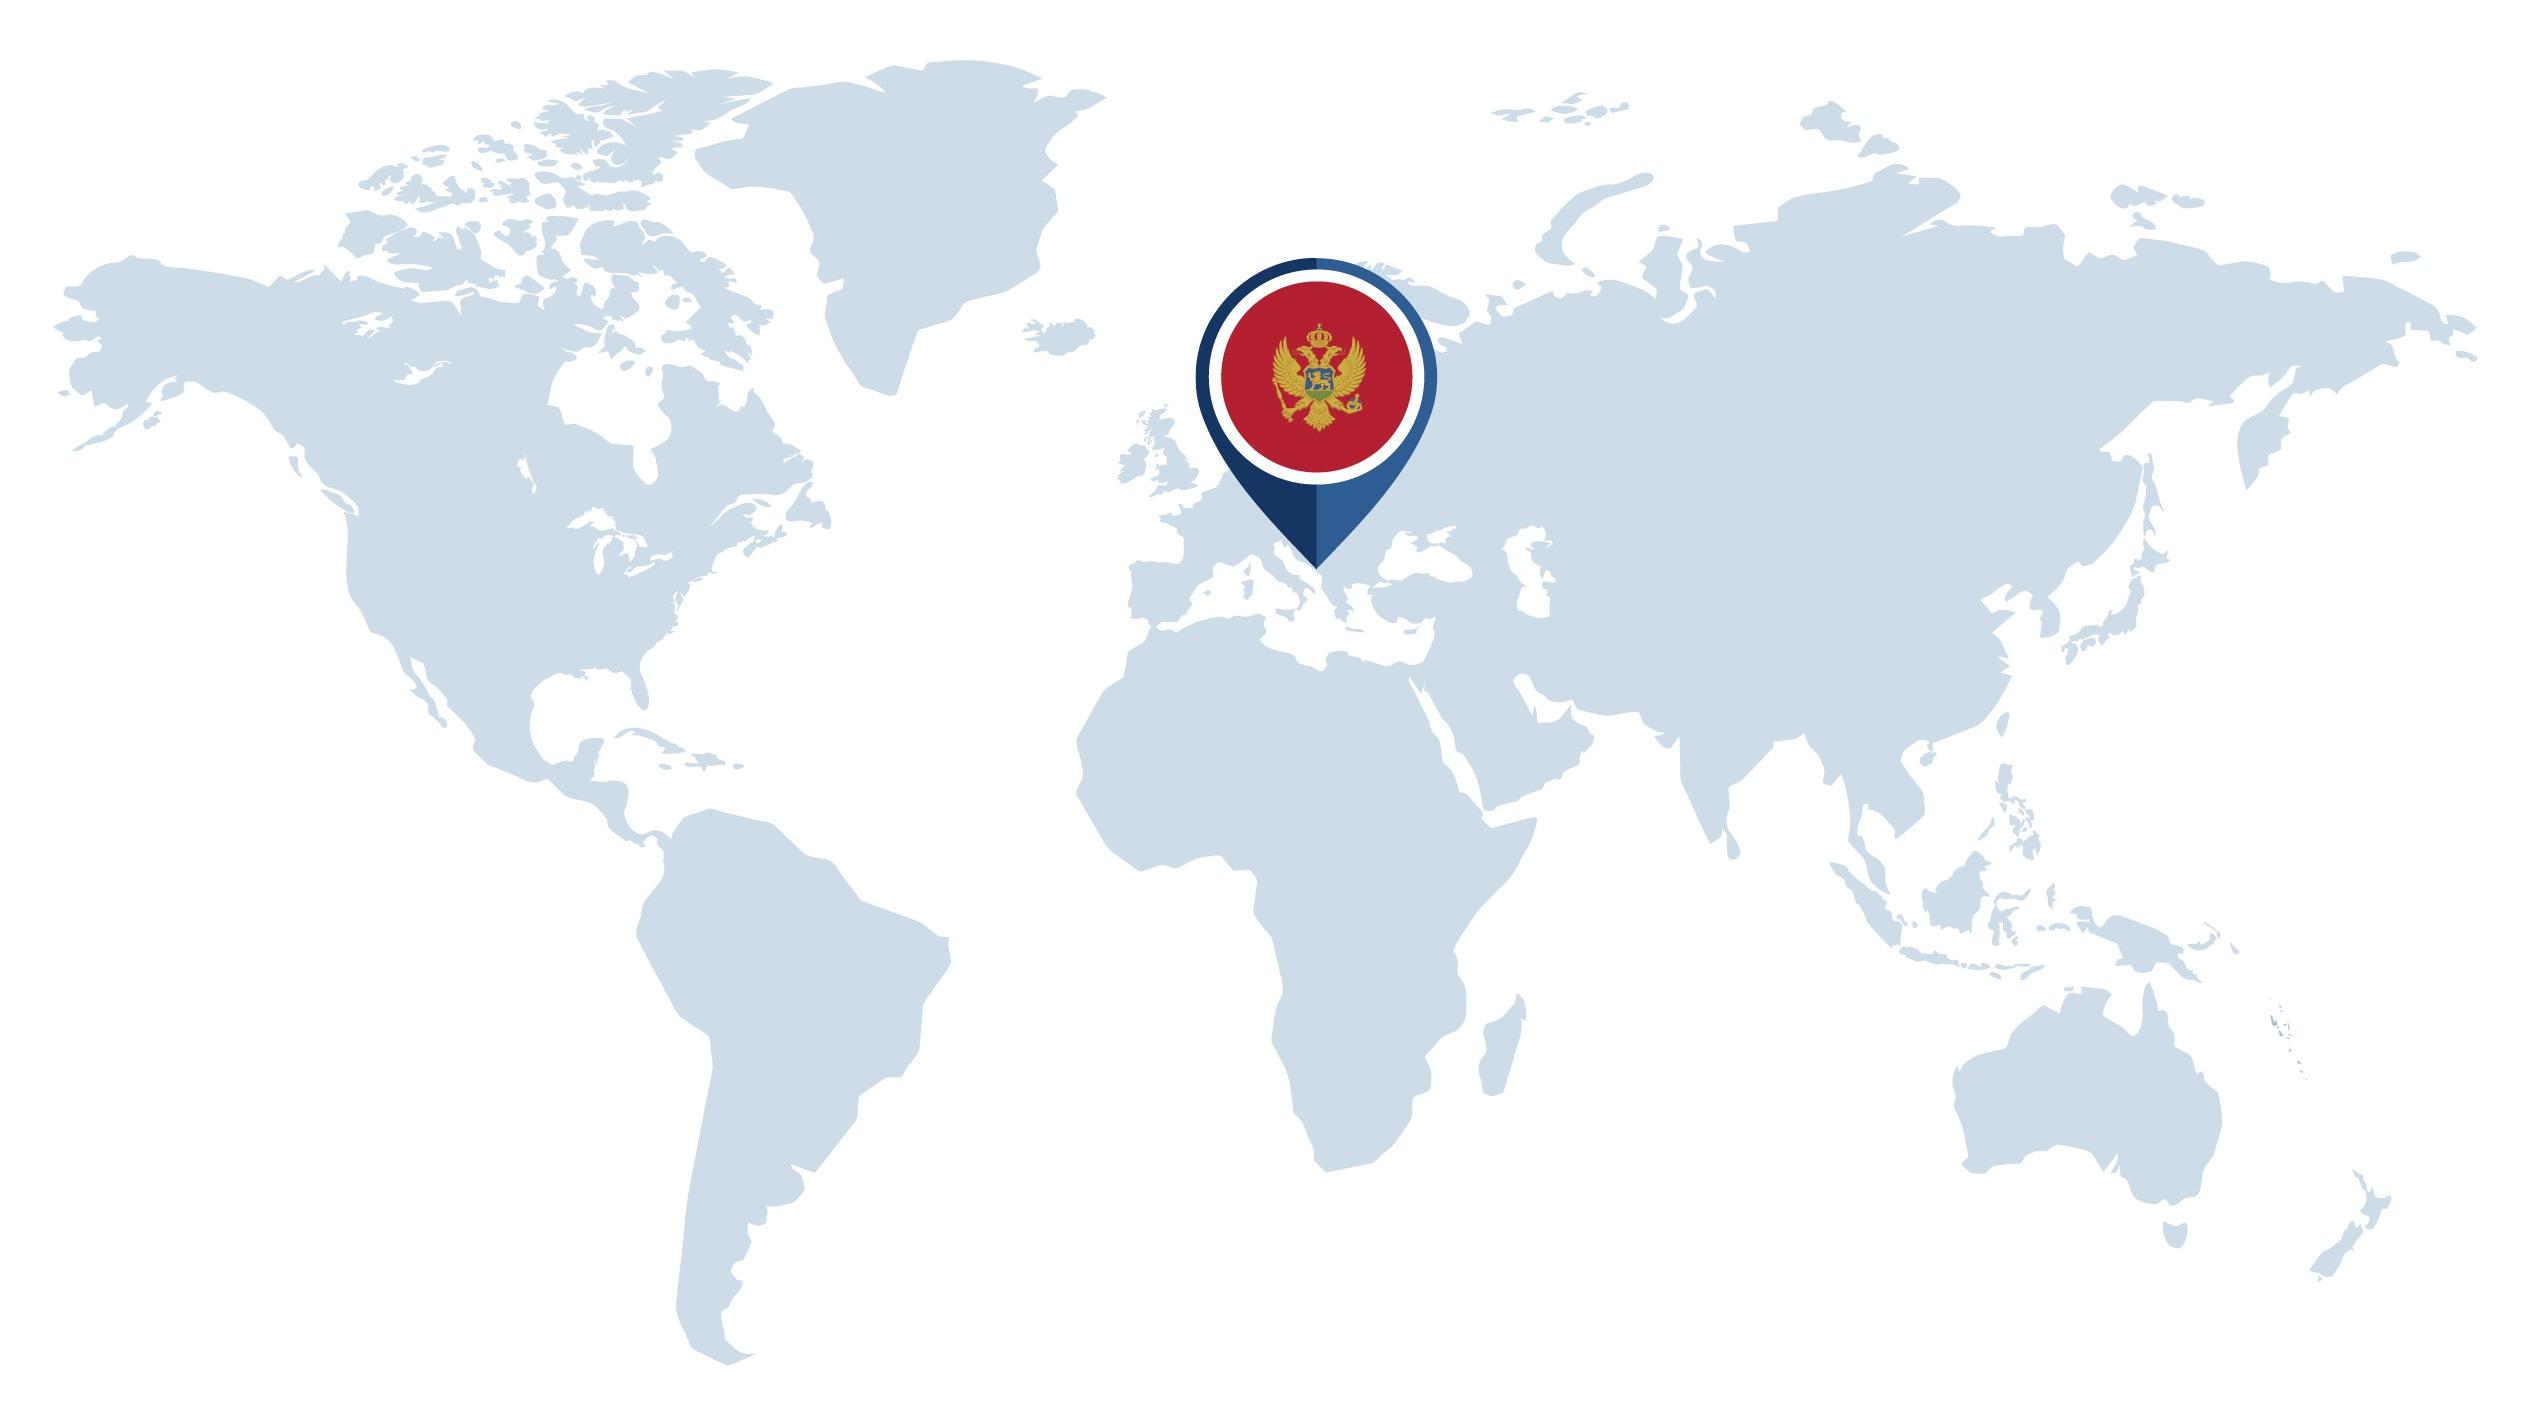 https://bluemina.com/wp-content/uploads/2020/06/Montenegro-map-and-flag-01-1.jpg